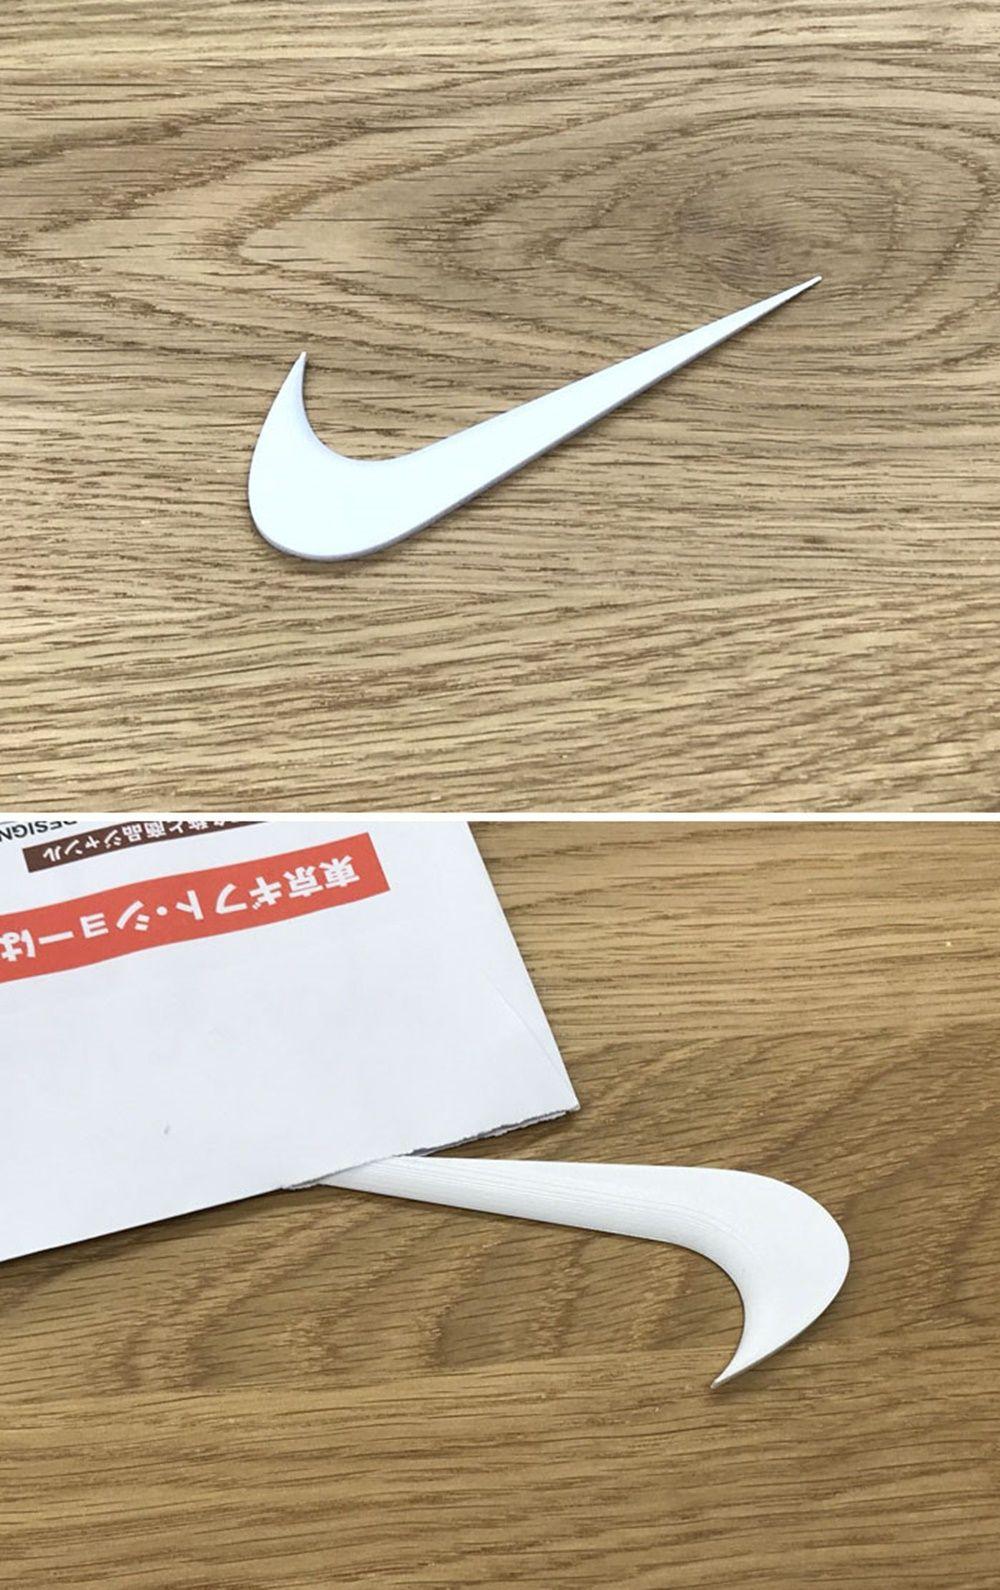 Logo Ujung Nike Tajam  Difungsikan Pembuka Amplop Kertas Unik Benda Terinspirasi Brand Terkenal